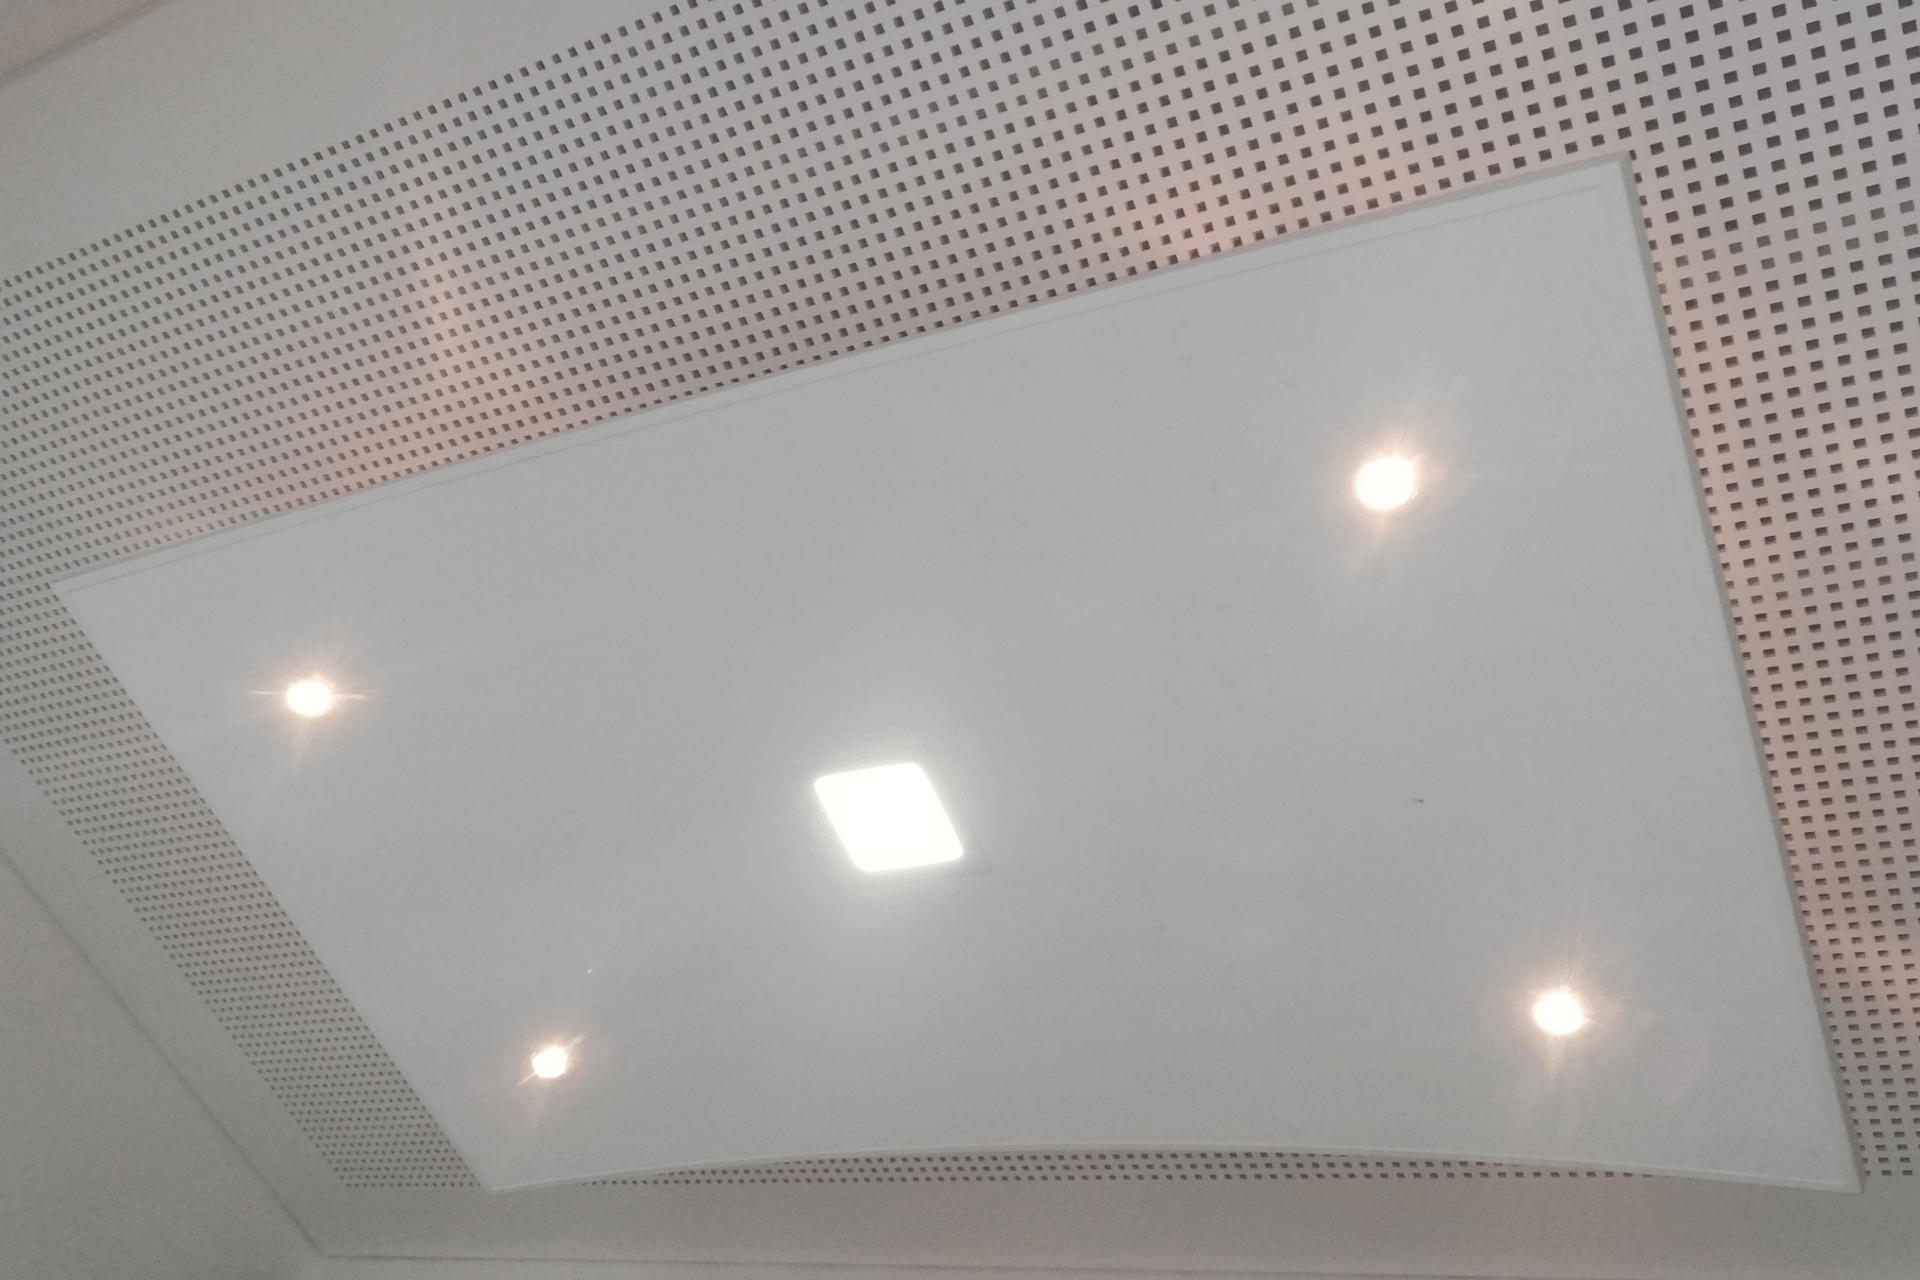 LED in Deckensegel integriert